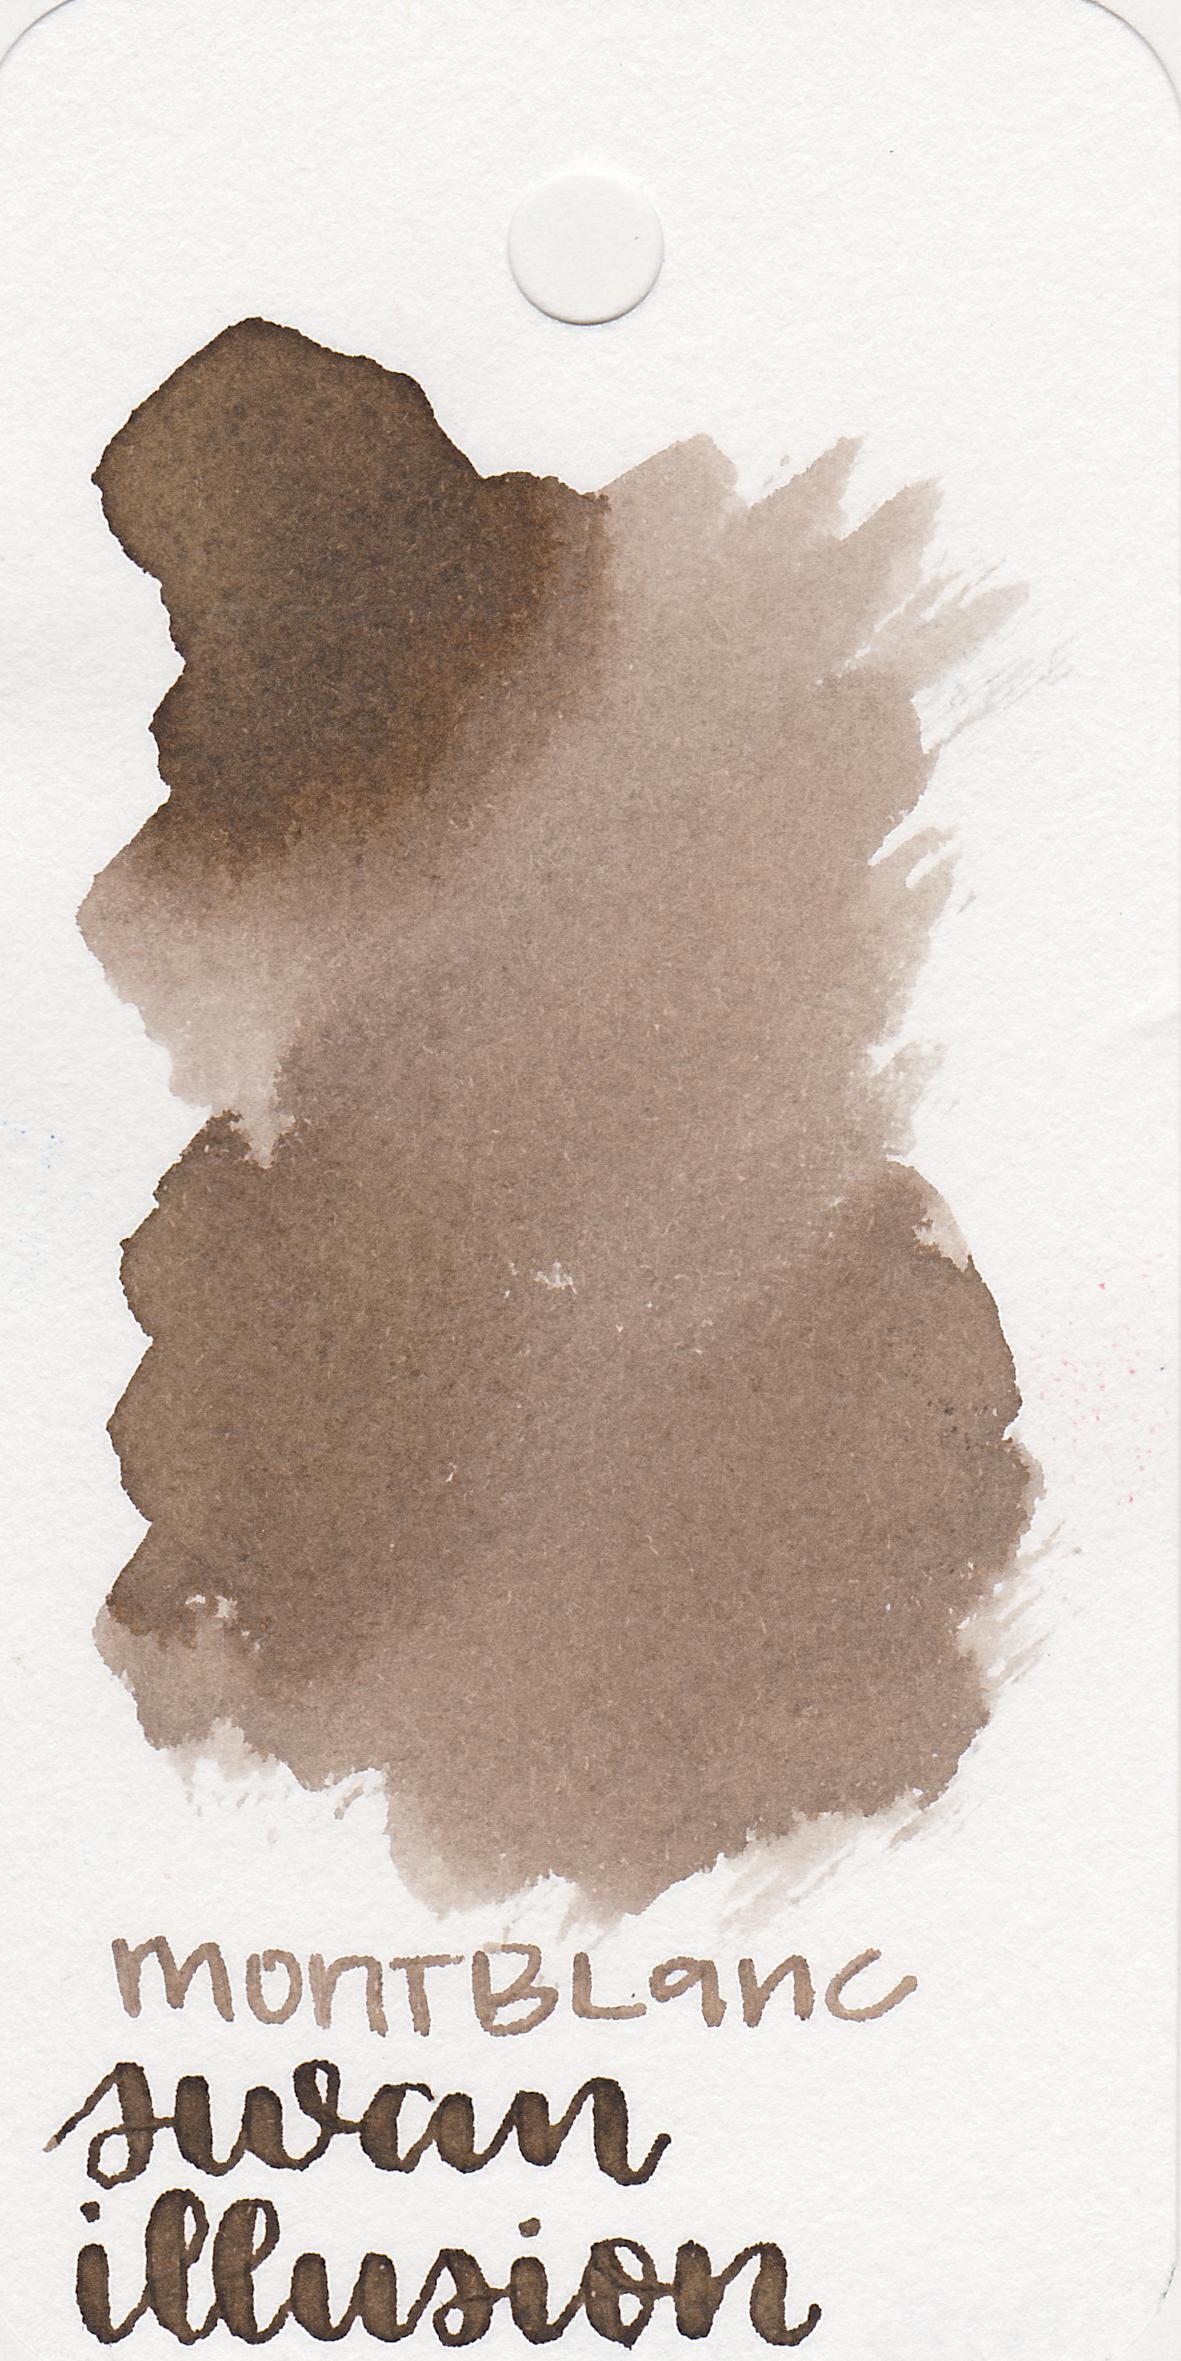 mb-swan-illusion-1.jpg